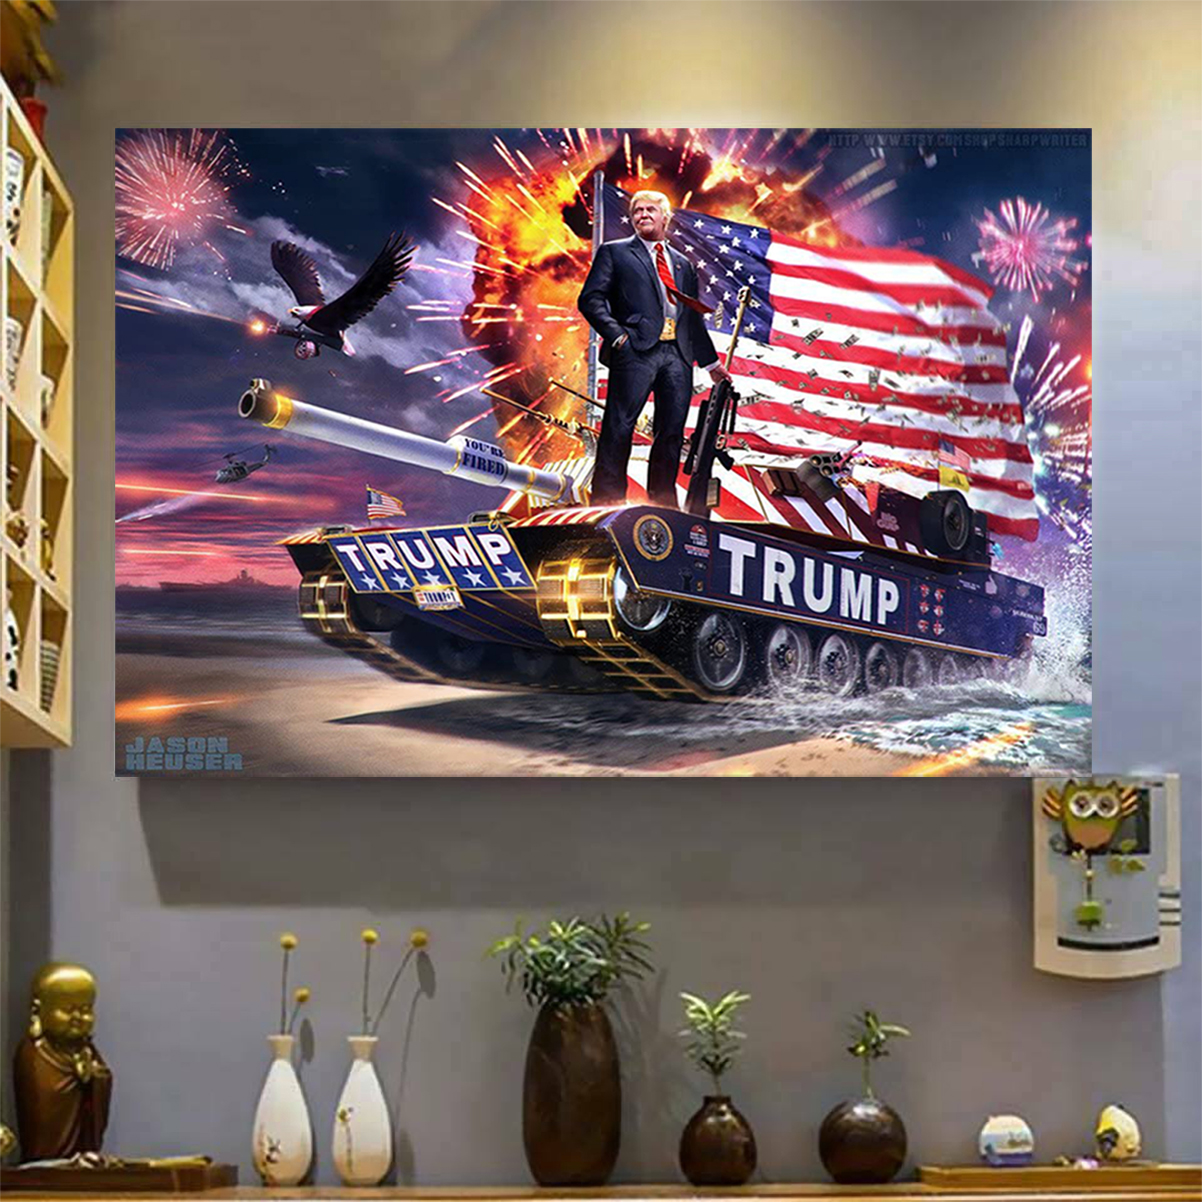 Trump tank poster A3